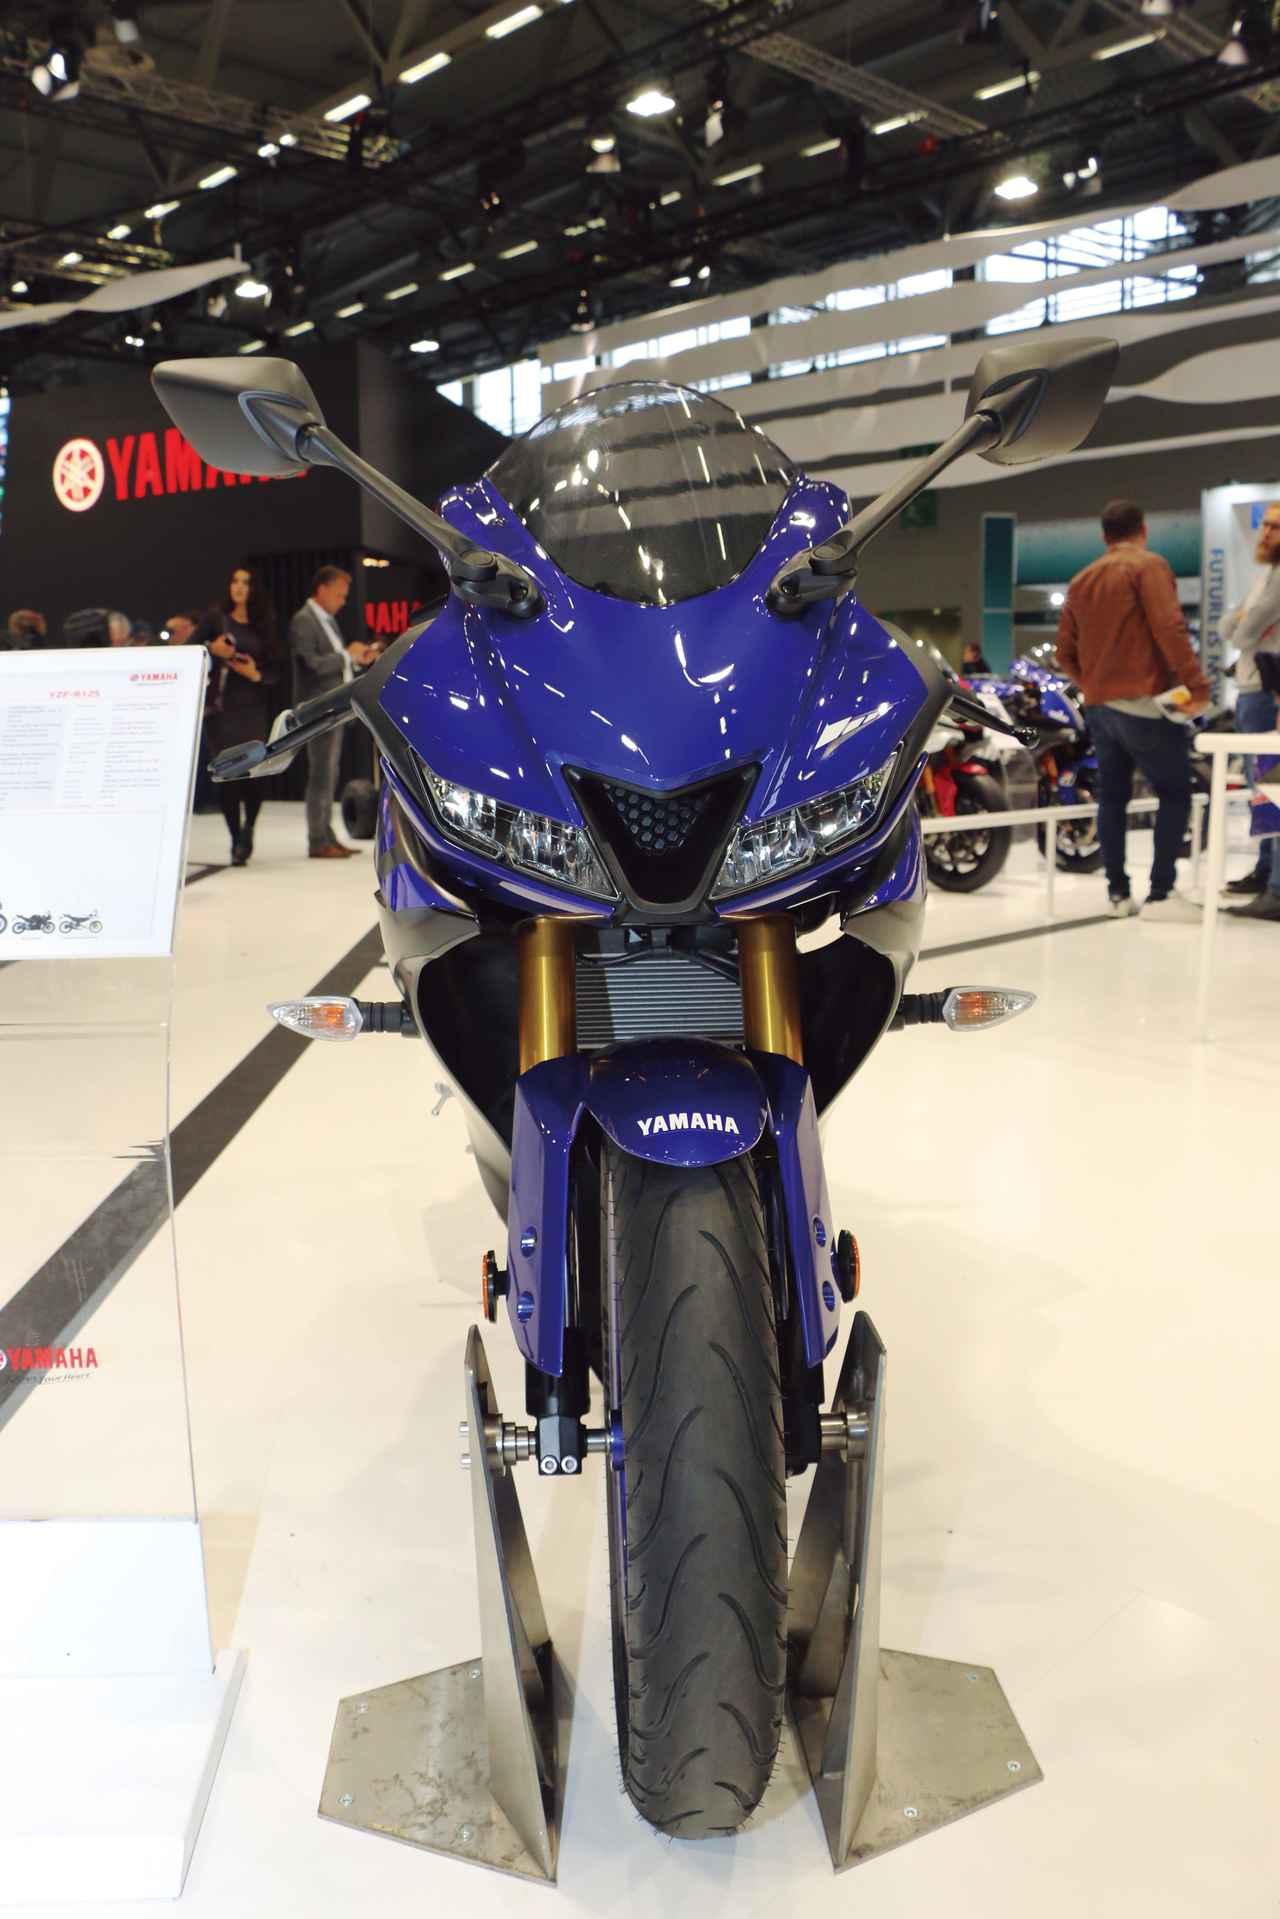 Images : 2番目の画像 - 「原付二種スーパースポーツがYZF-R15をベースに全身リニューアル!『YAMAHA YZF-R125』」のアルバム - LAWRENCE - Motorcycle x Cars + α = Your Life.